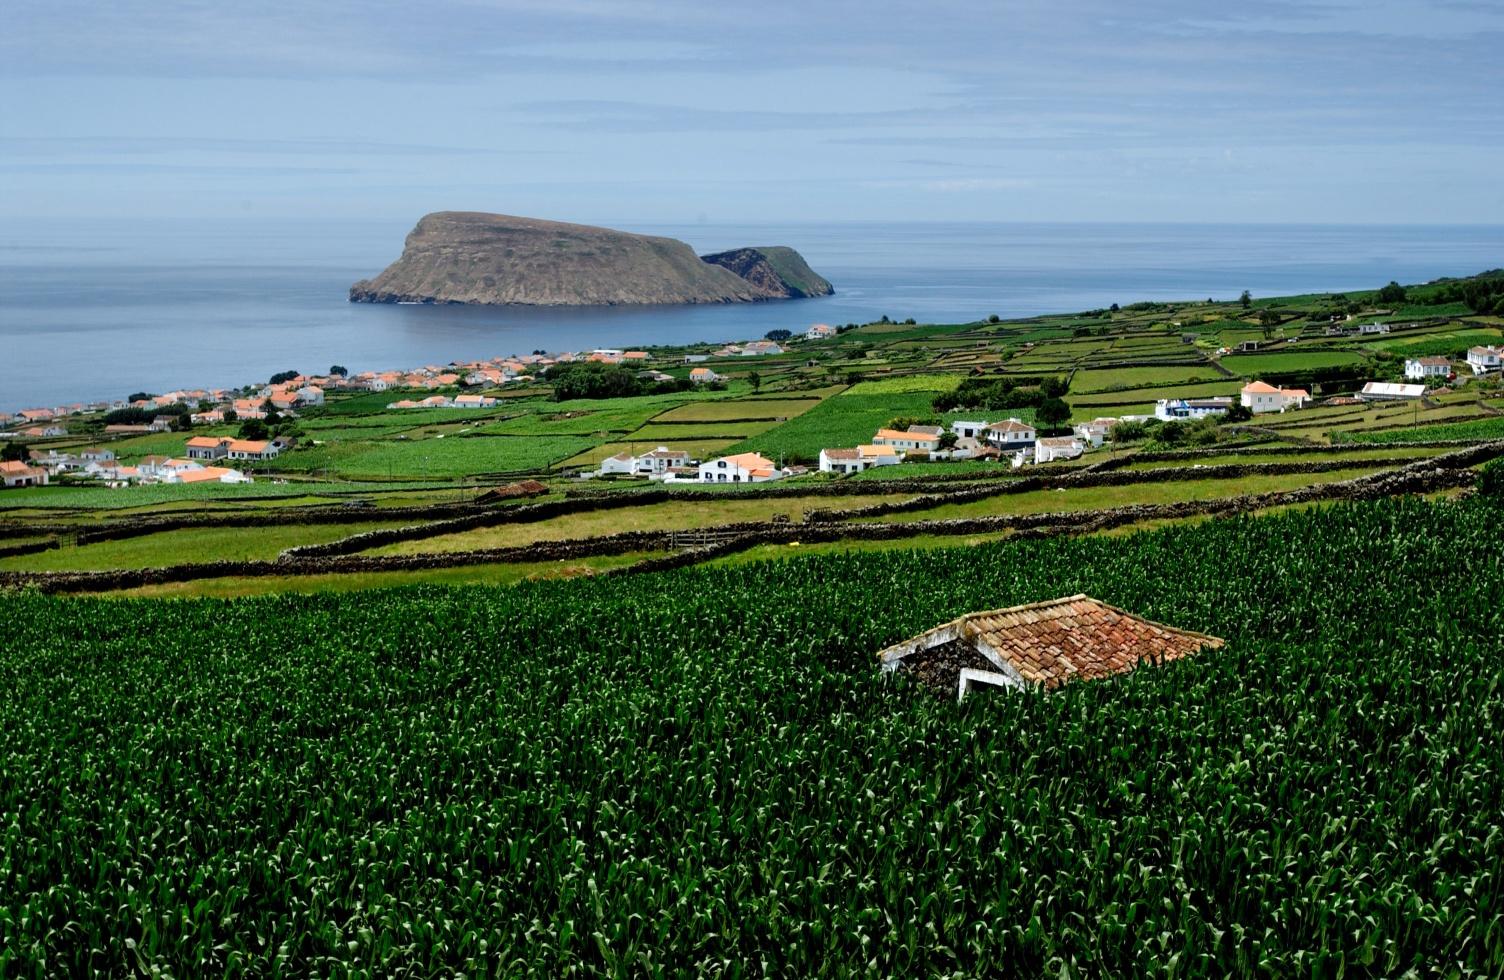 Panorama di Terceira, Azzorre. Foto Associacao de Turismo dos Acores